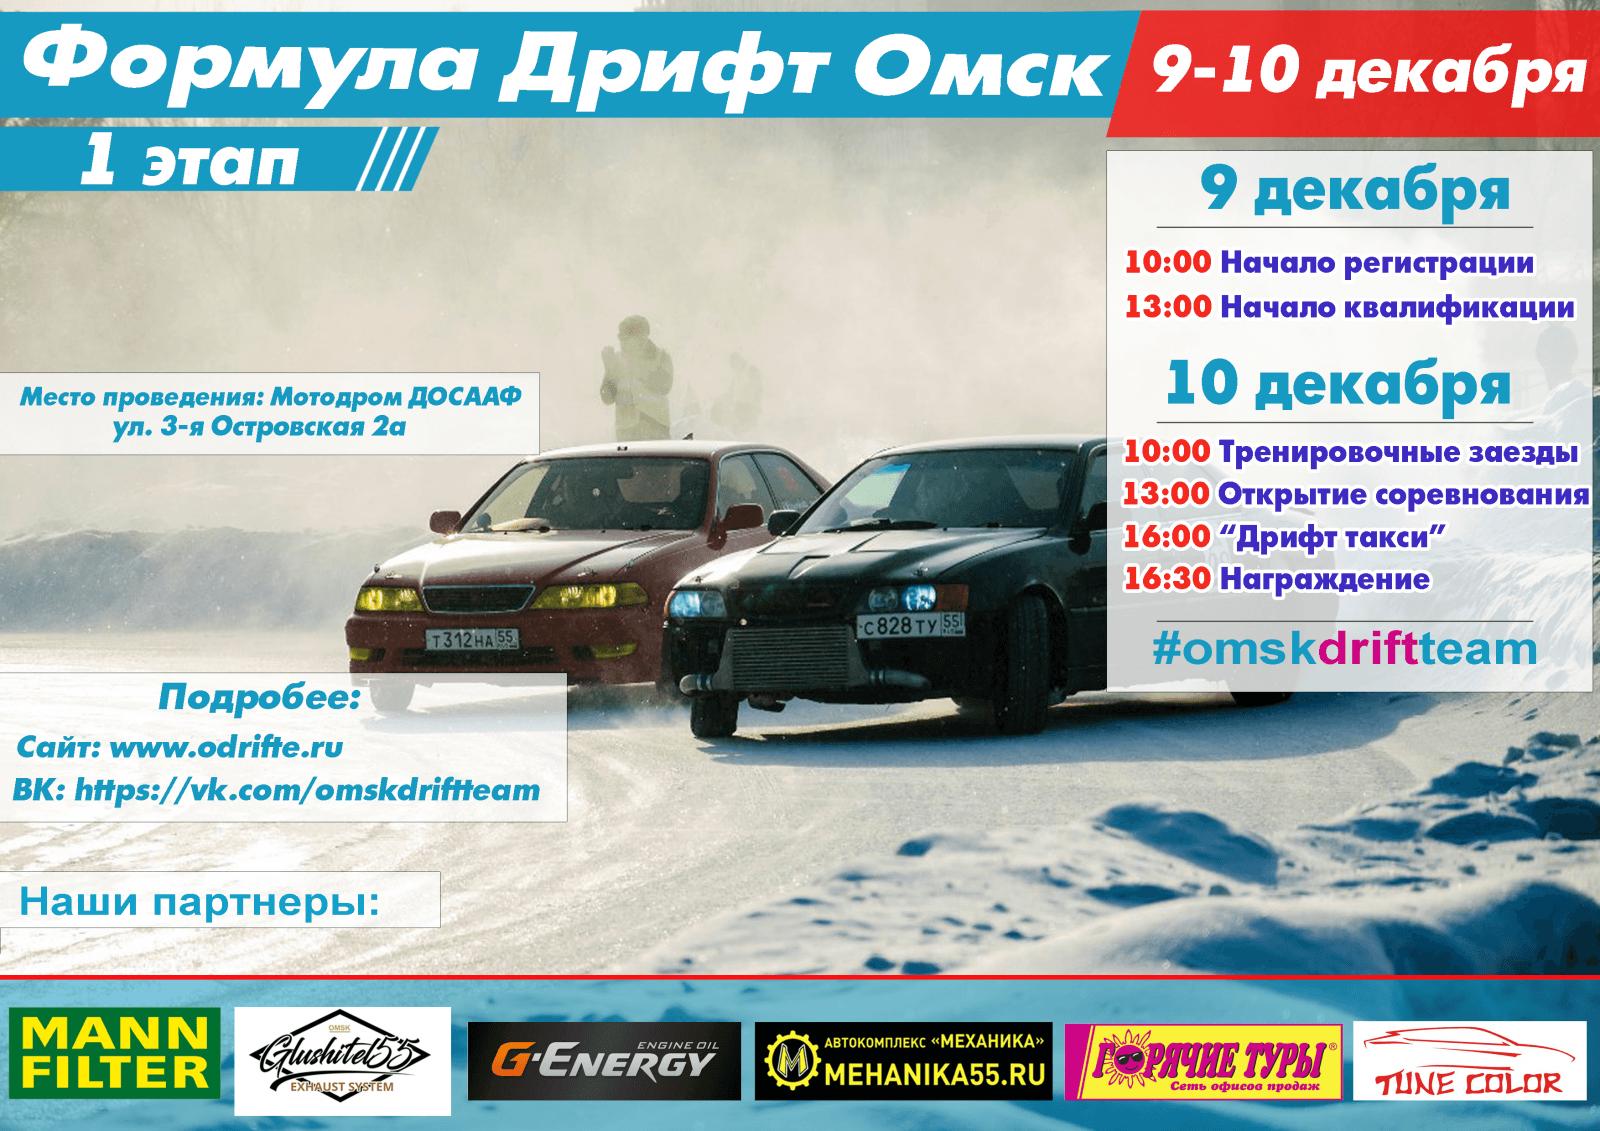 «Формула дрифт Омск. Сезон 2017-2018»